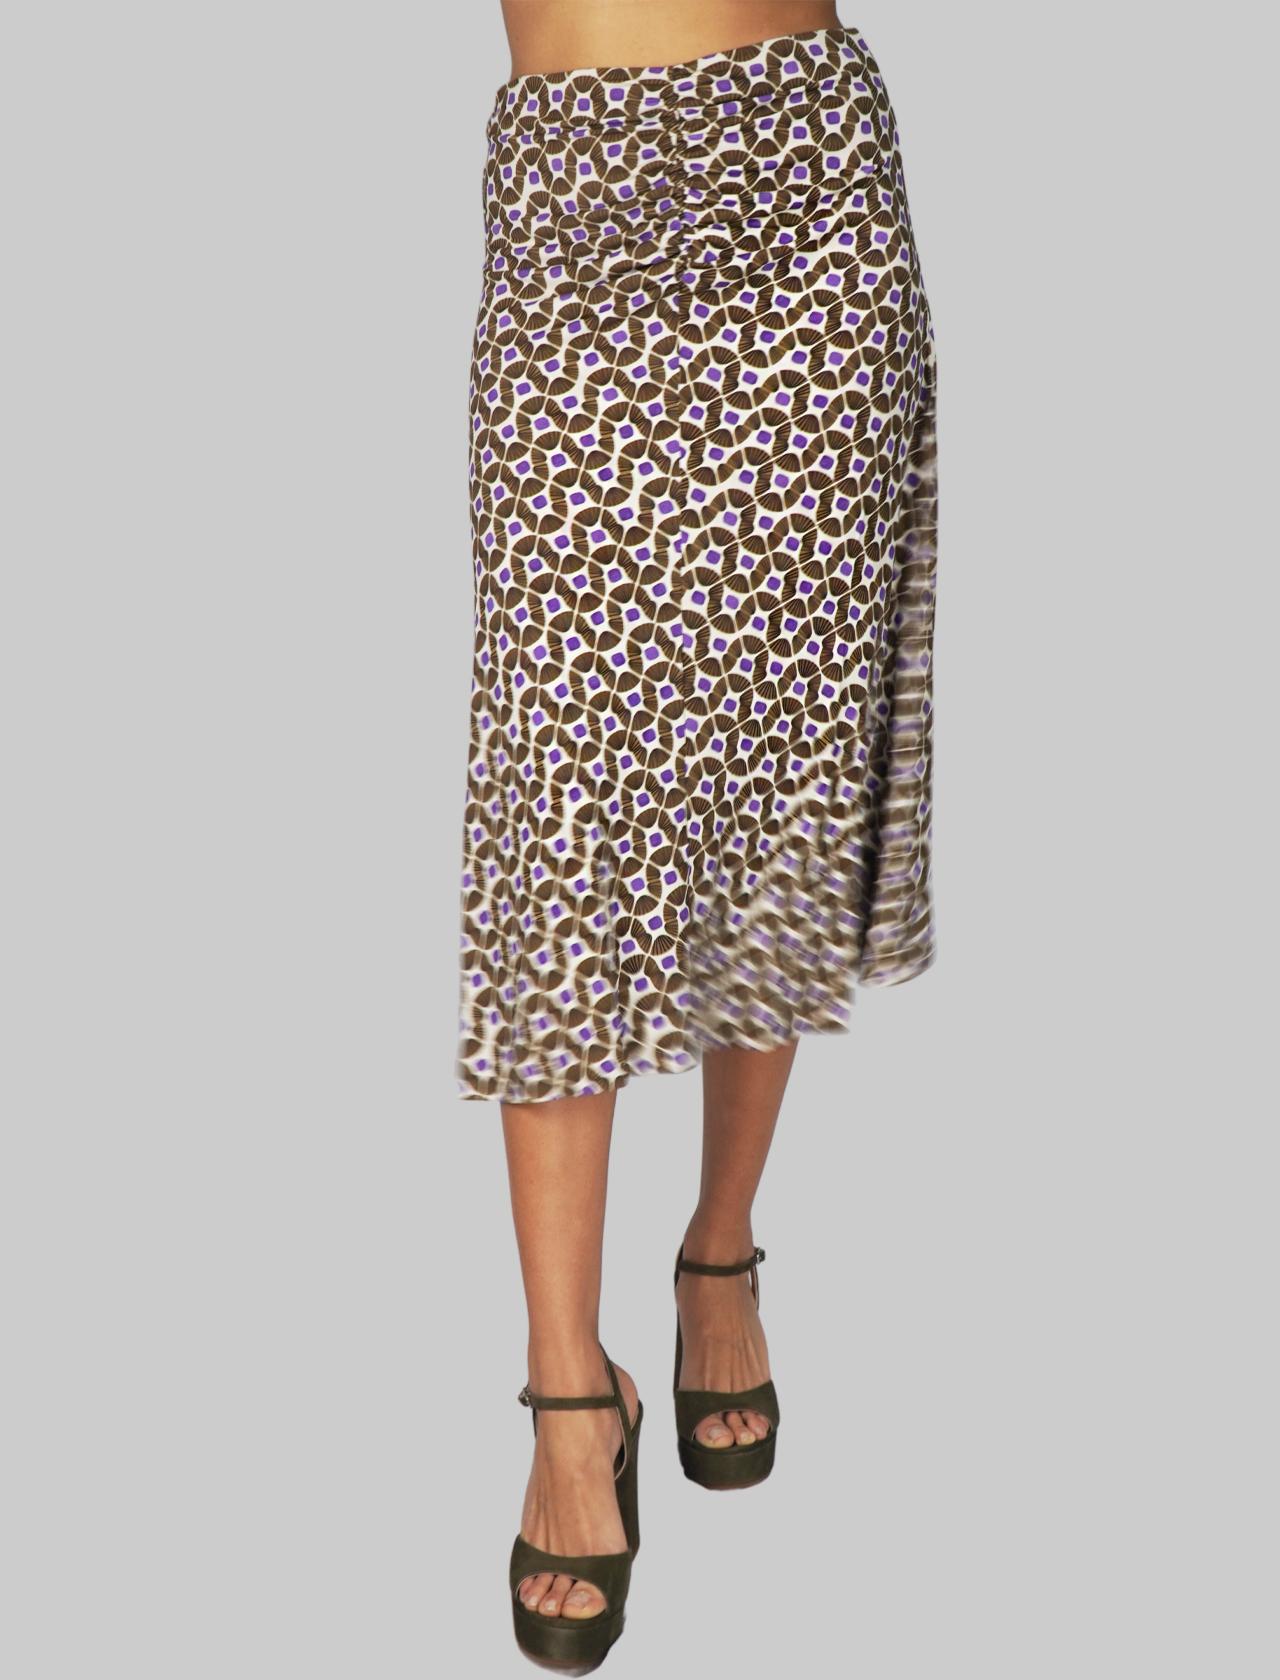 Abbigliamento Donna Gonna Jersey Happy Frame a Fantasia Beige Maliparmi | Gonne e Pantaloni | JG359070493B1104